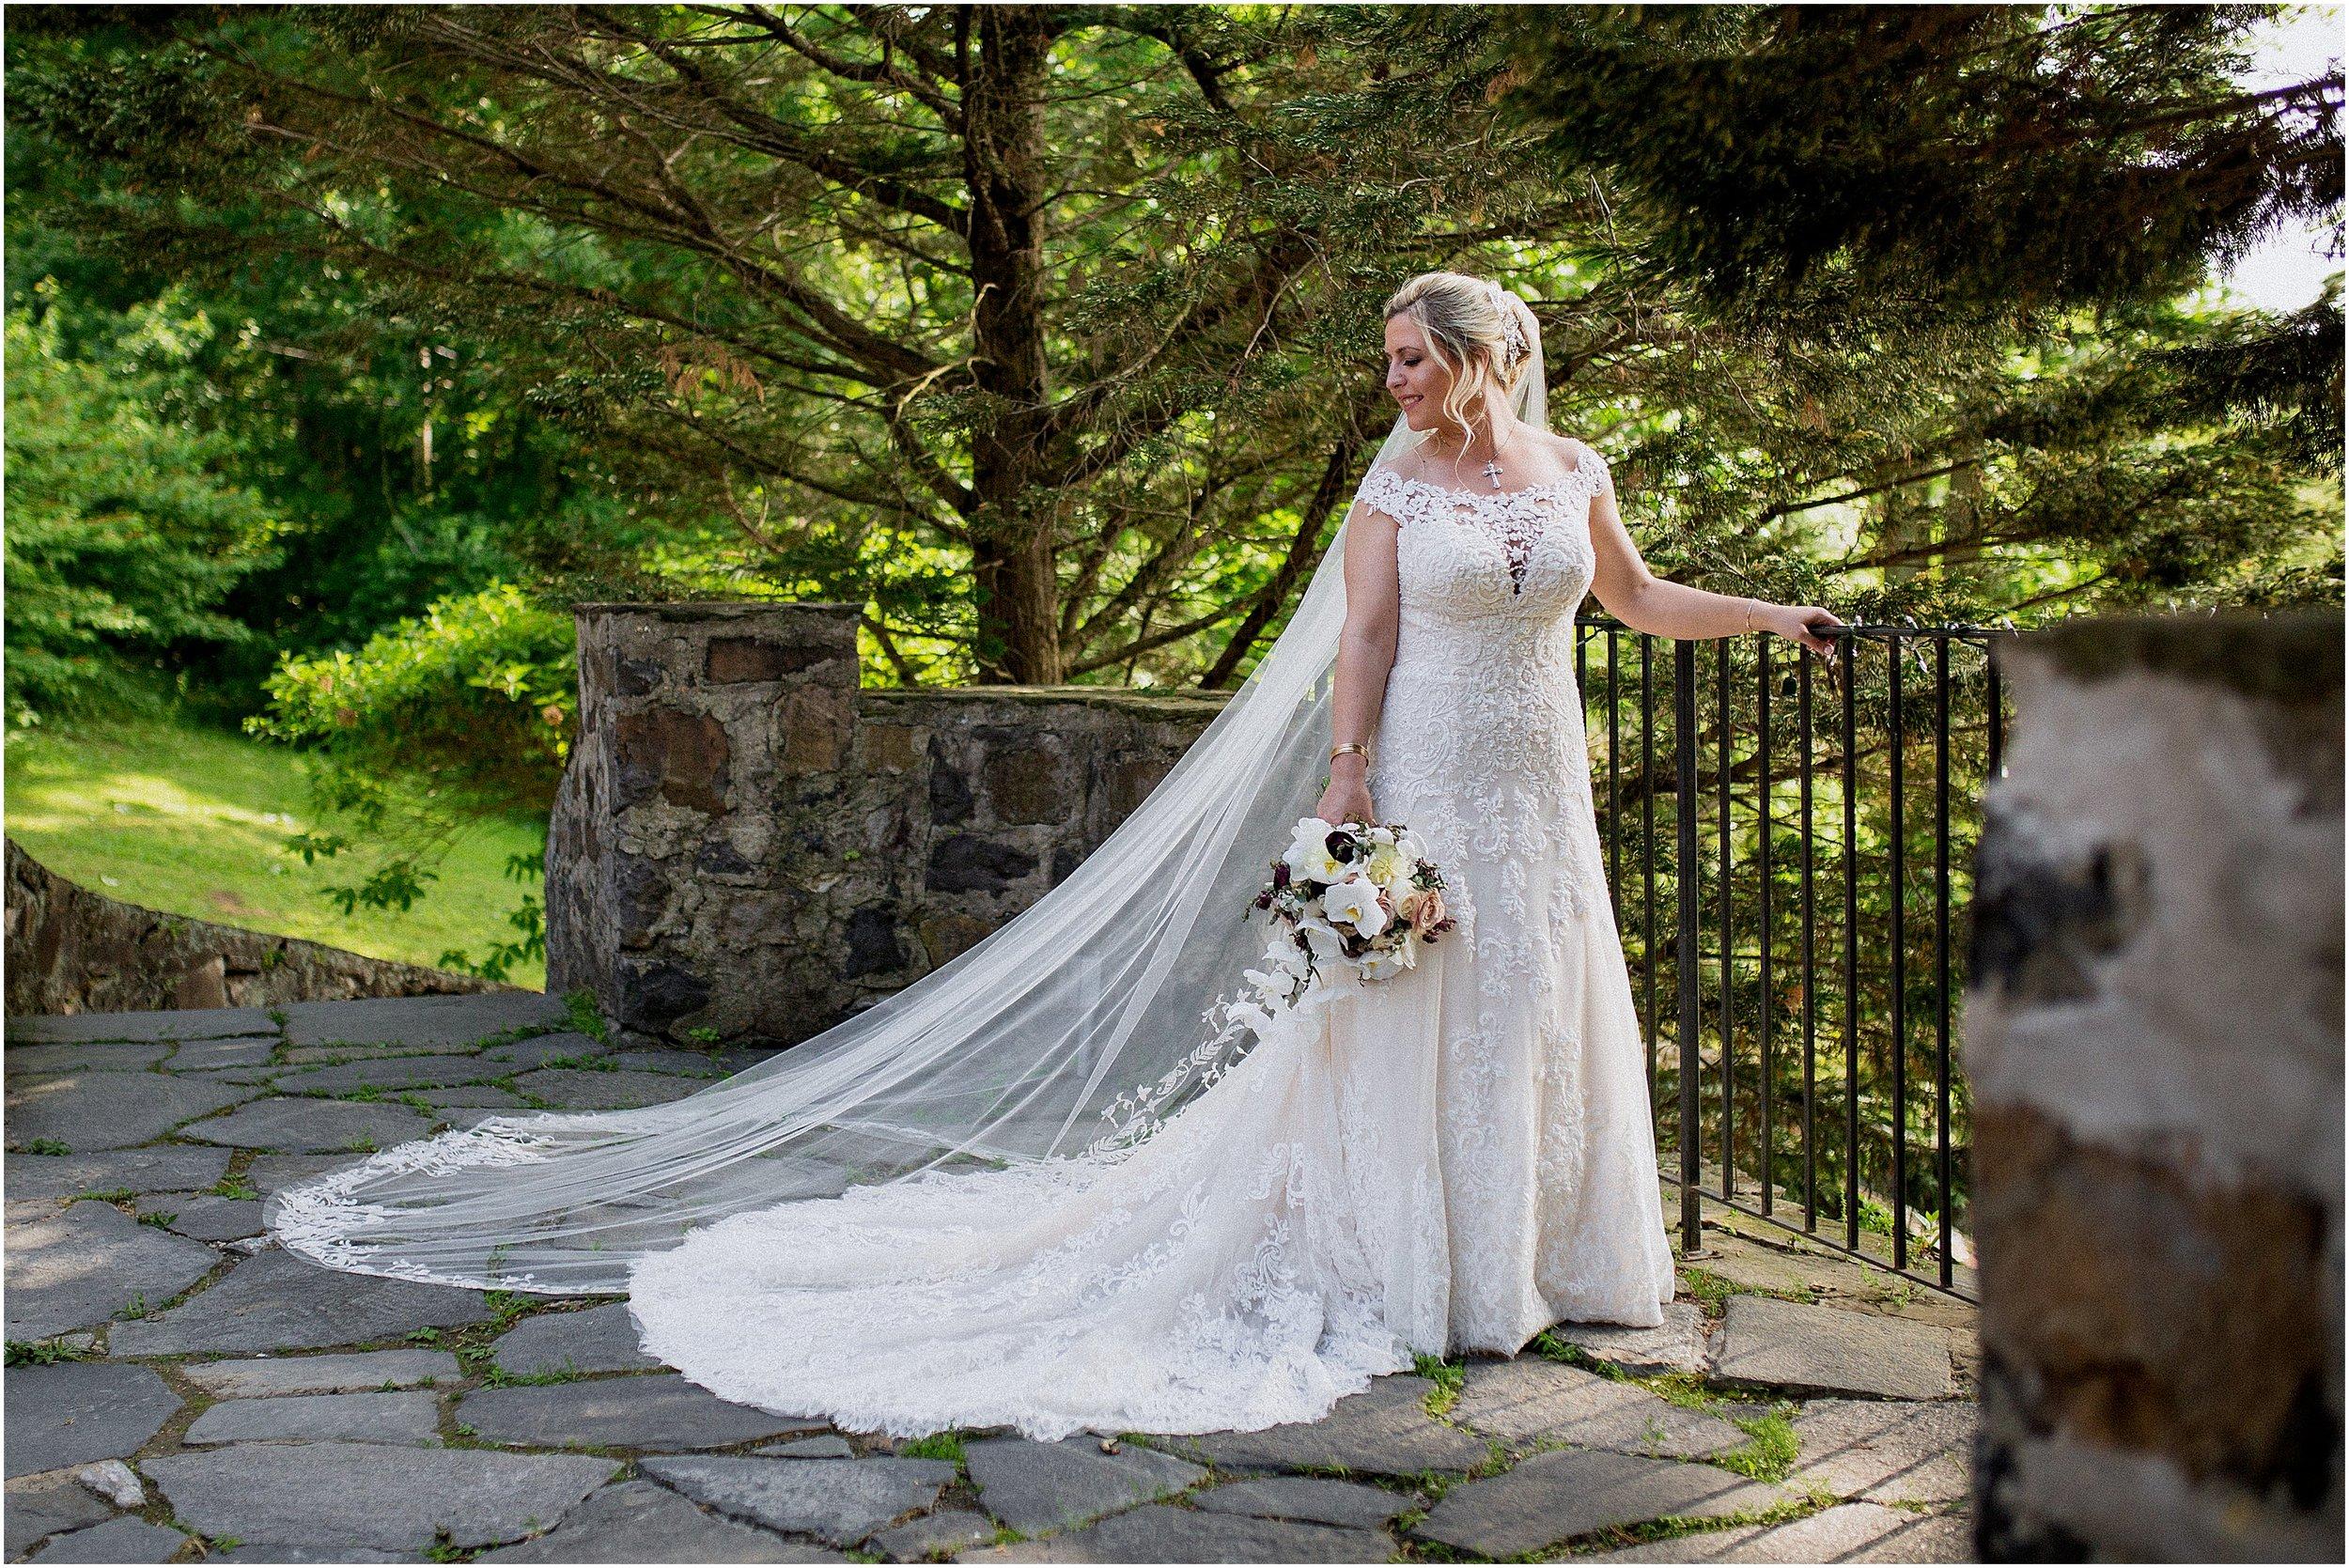 Philly_Wedding_Photographer_0034.jpg